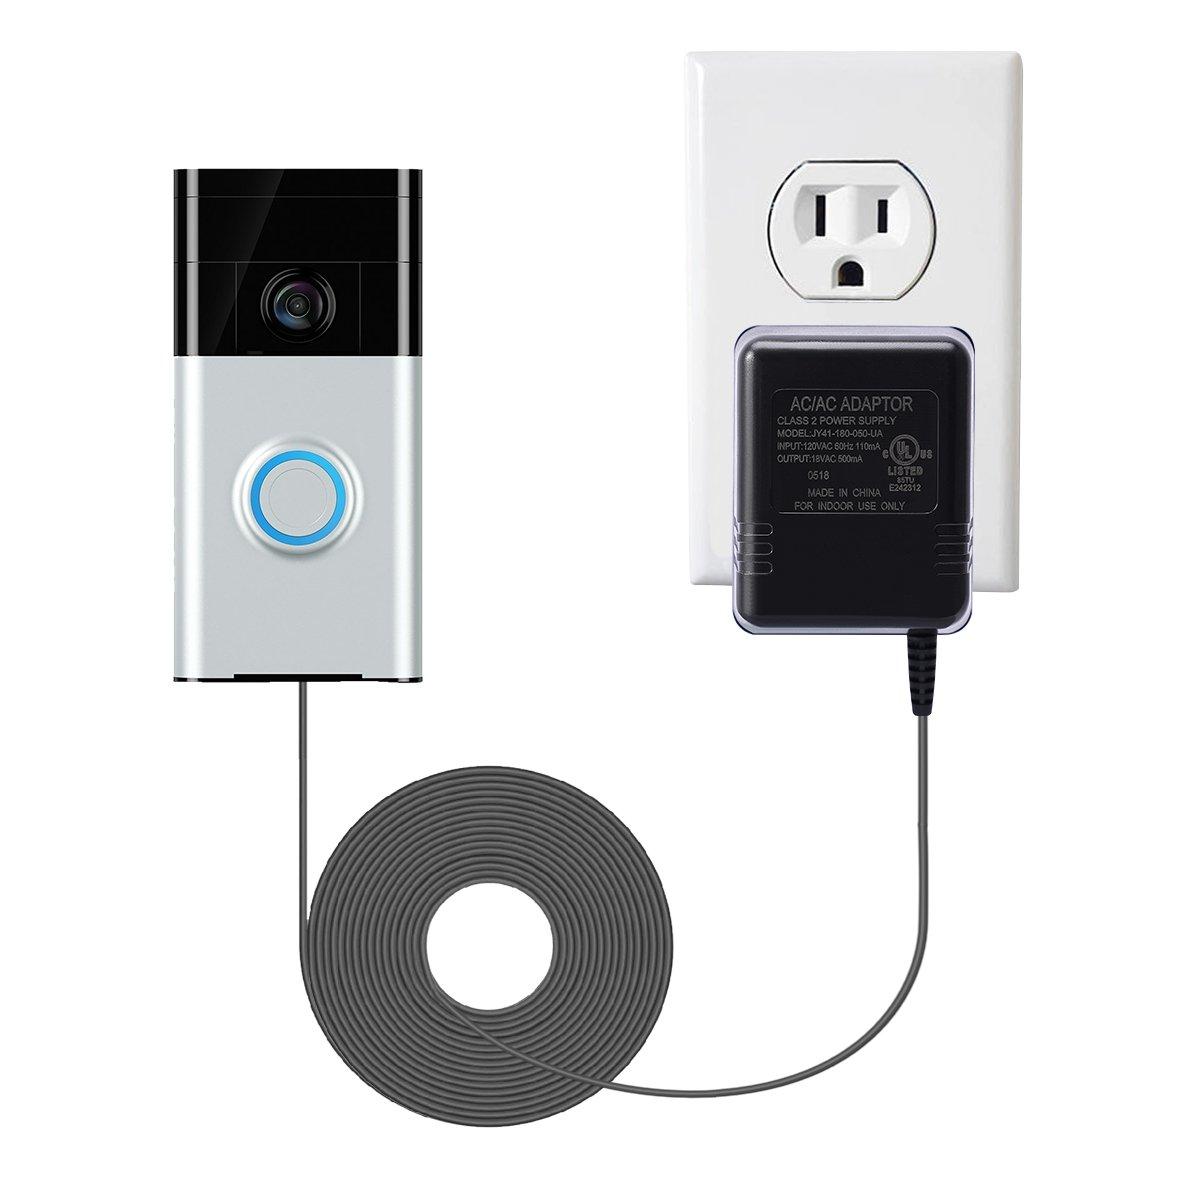 LANMU Power Adapter for Ring Video Doorbell Power Supply for Ring Video Doorbell 2 Ring Video Doorbell Pro Nest Hello Video Doorbell and Zmodo Smart Greet Wi Fi Video Doorbell